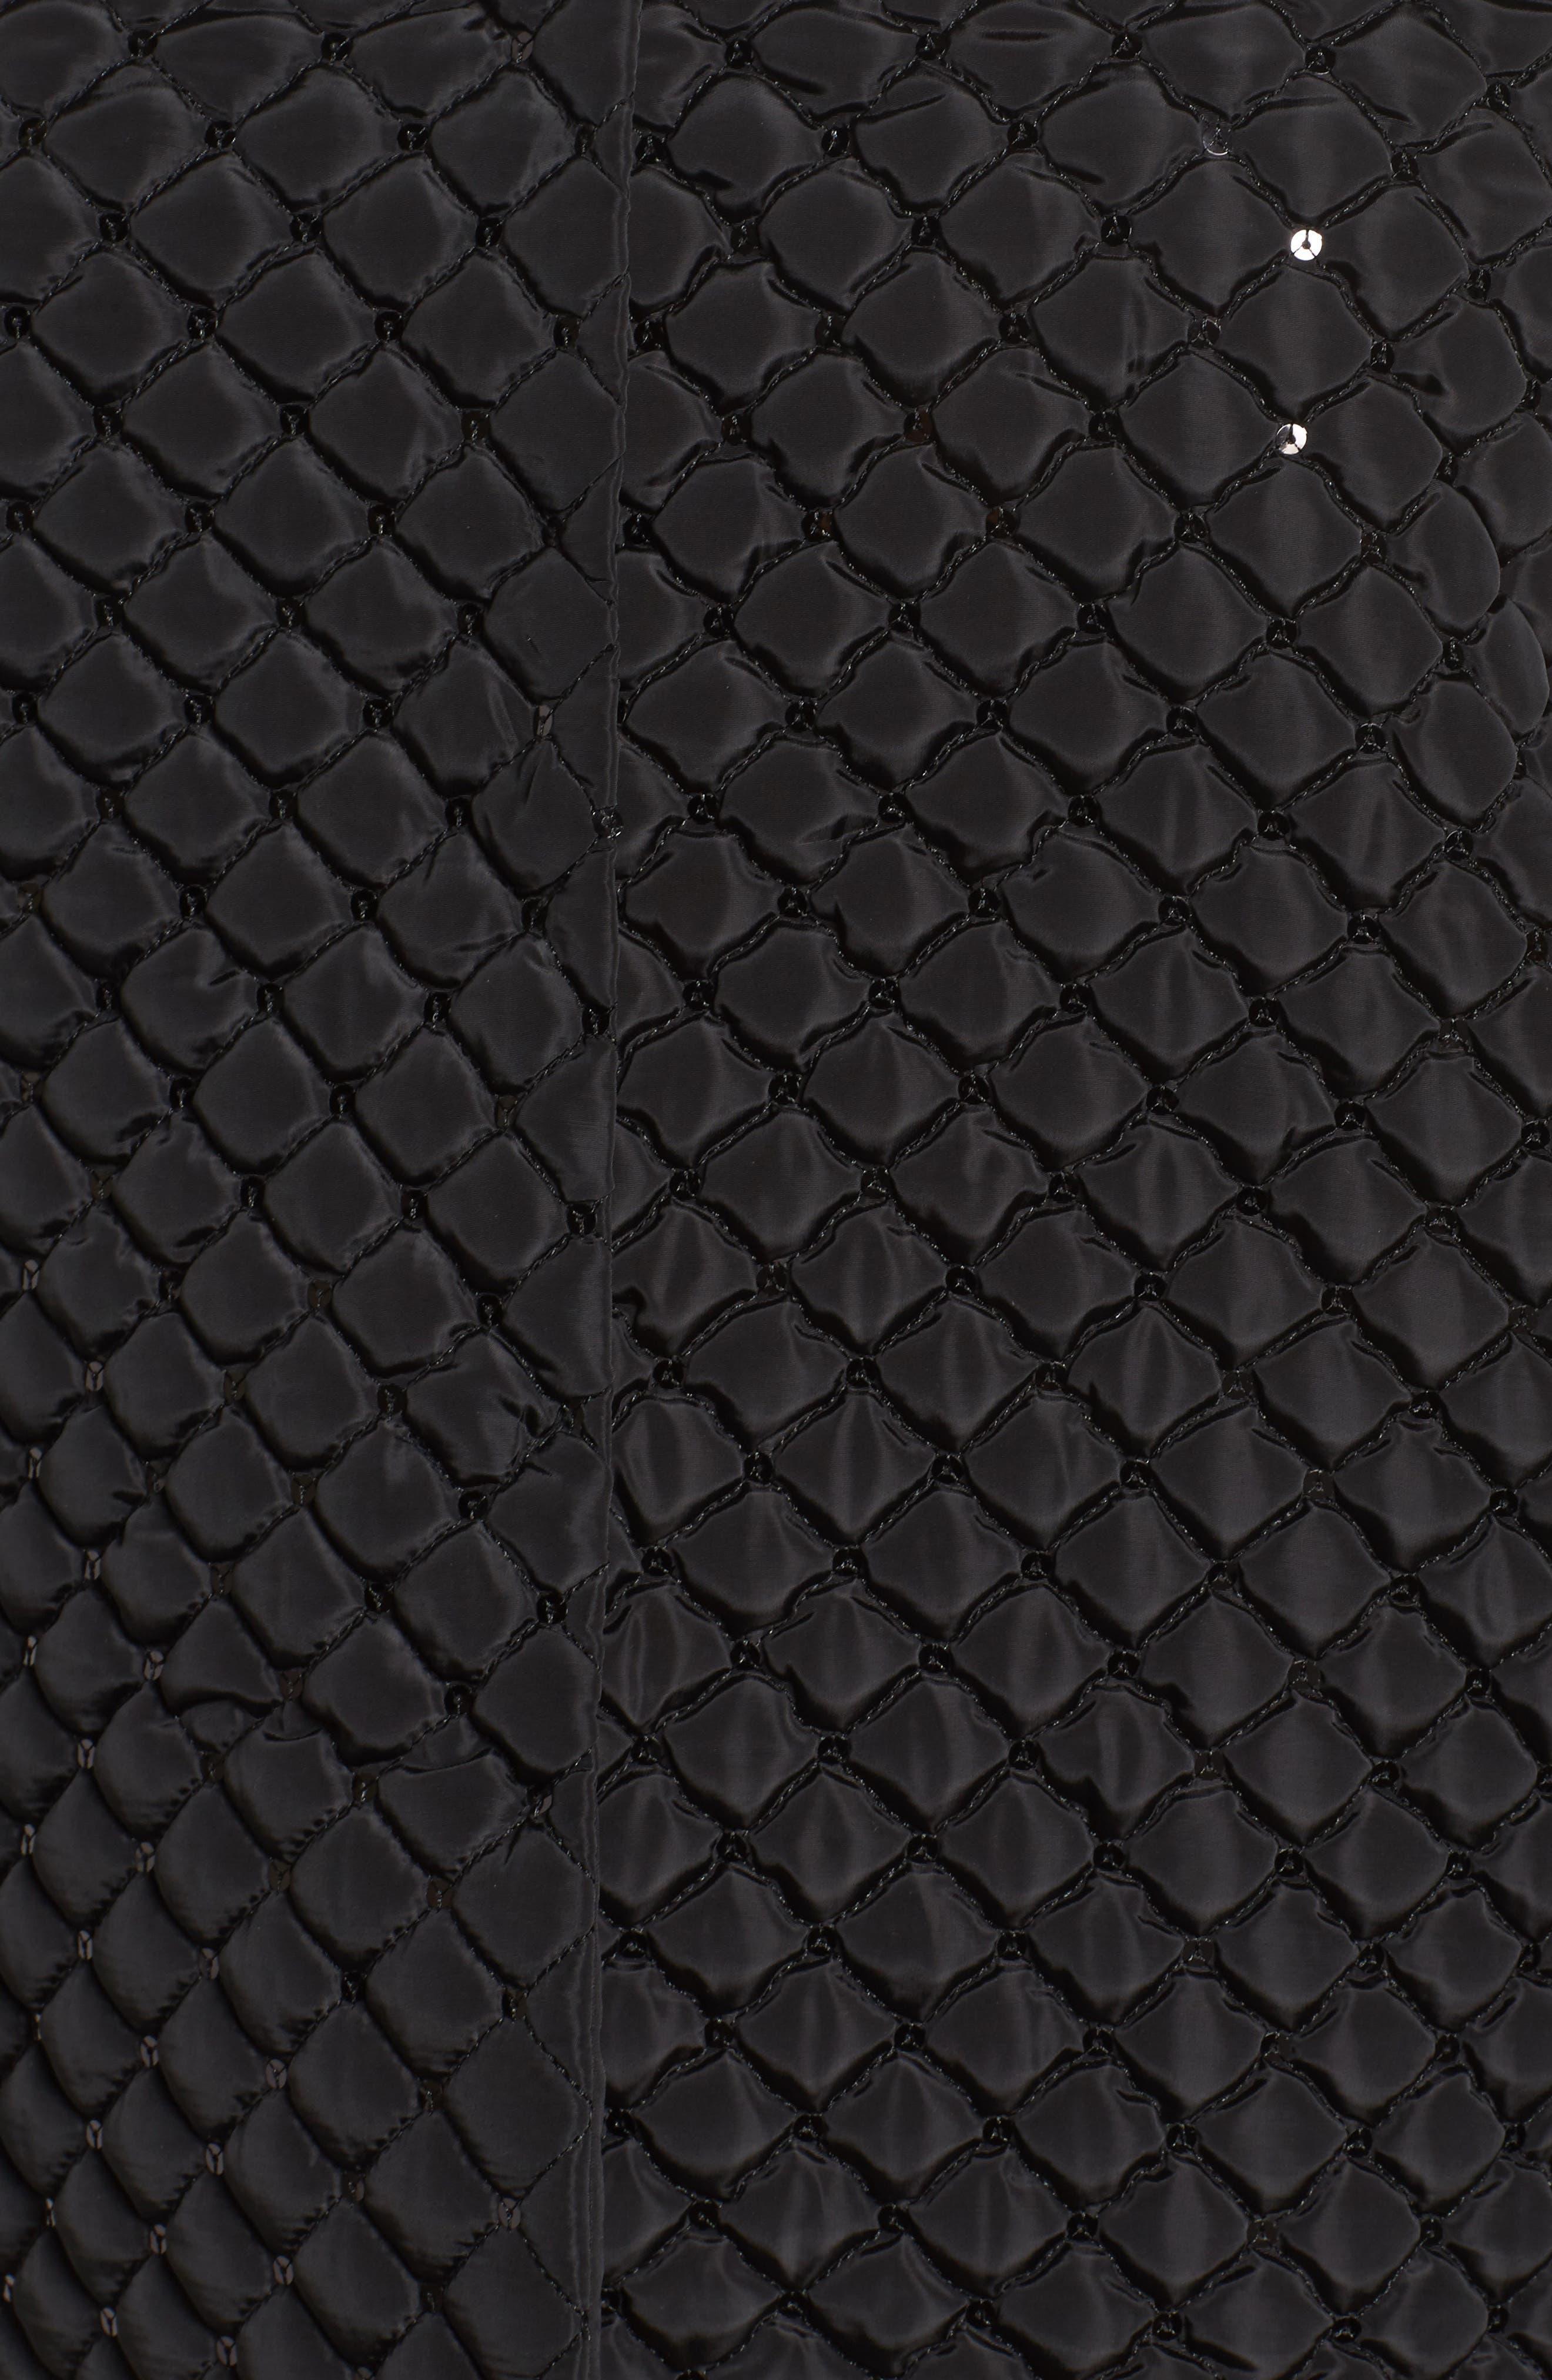 Papaia Sequin Jacket,                             Alternate thumbnail 6, color,                             001